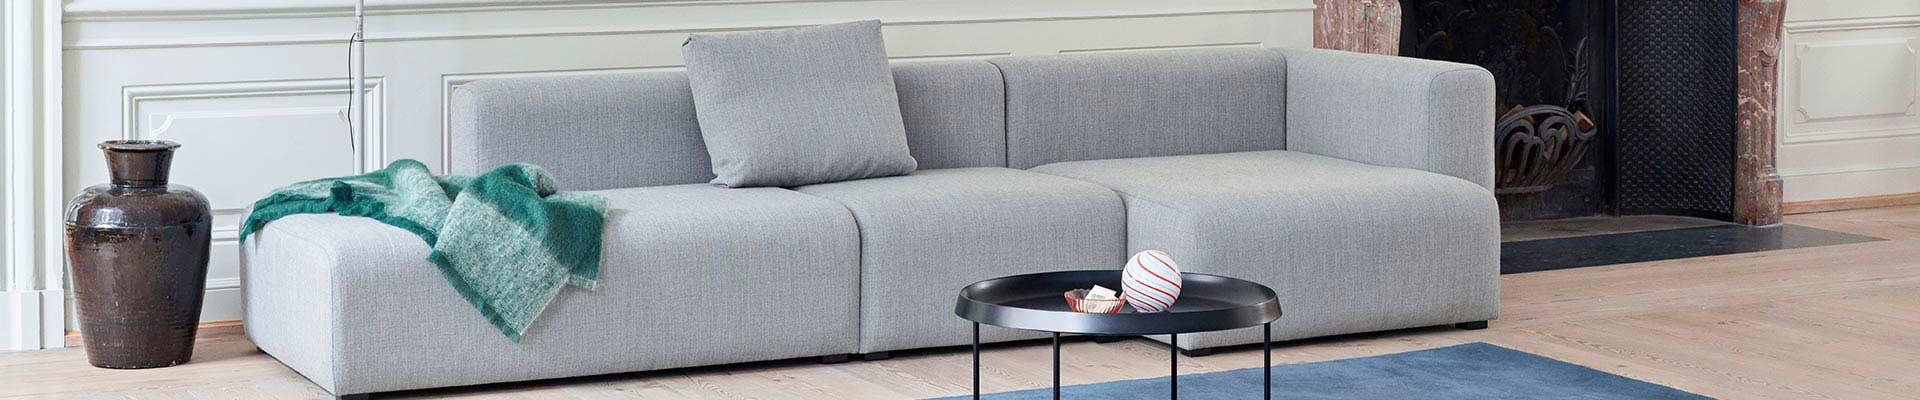 HAY Silhouette Sofa